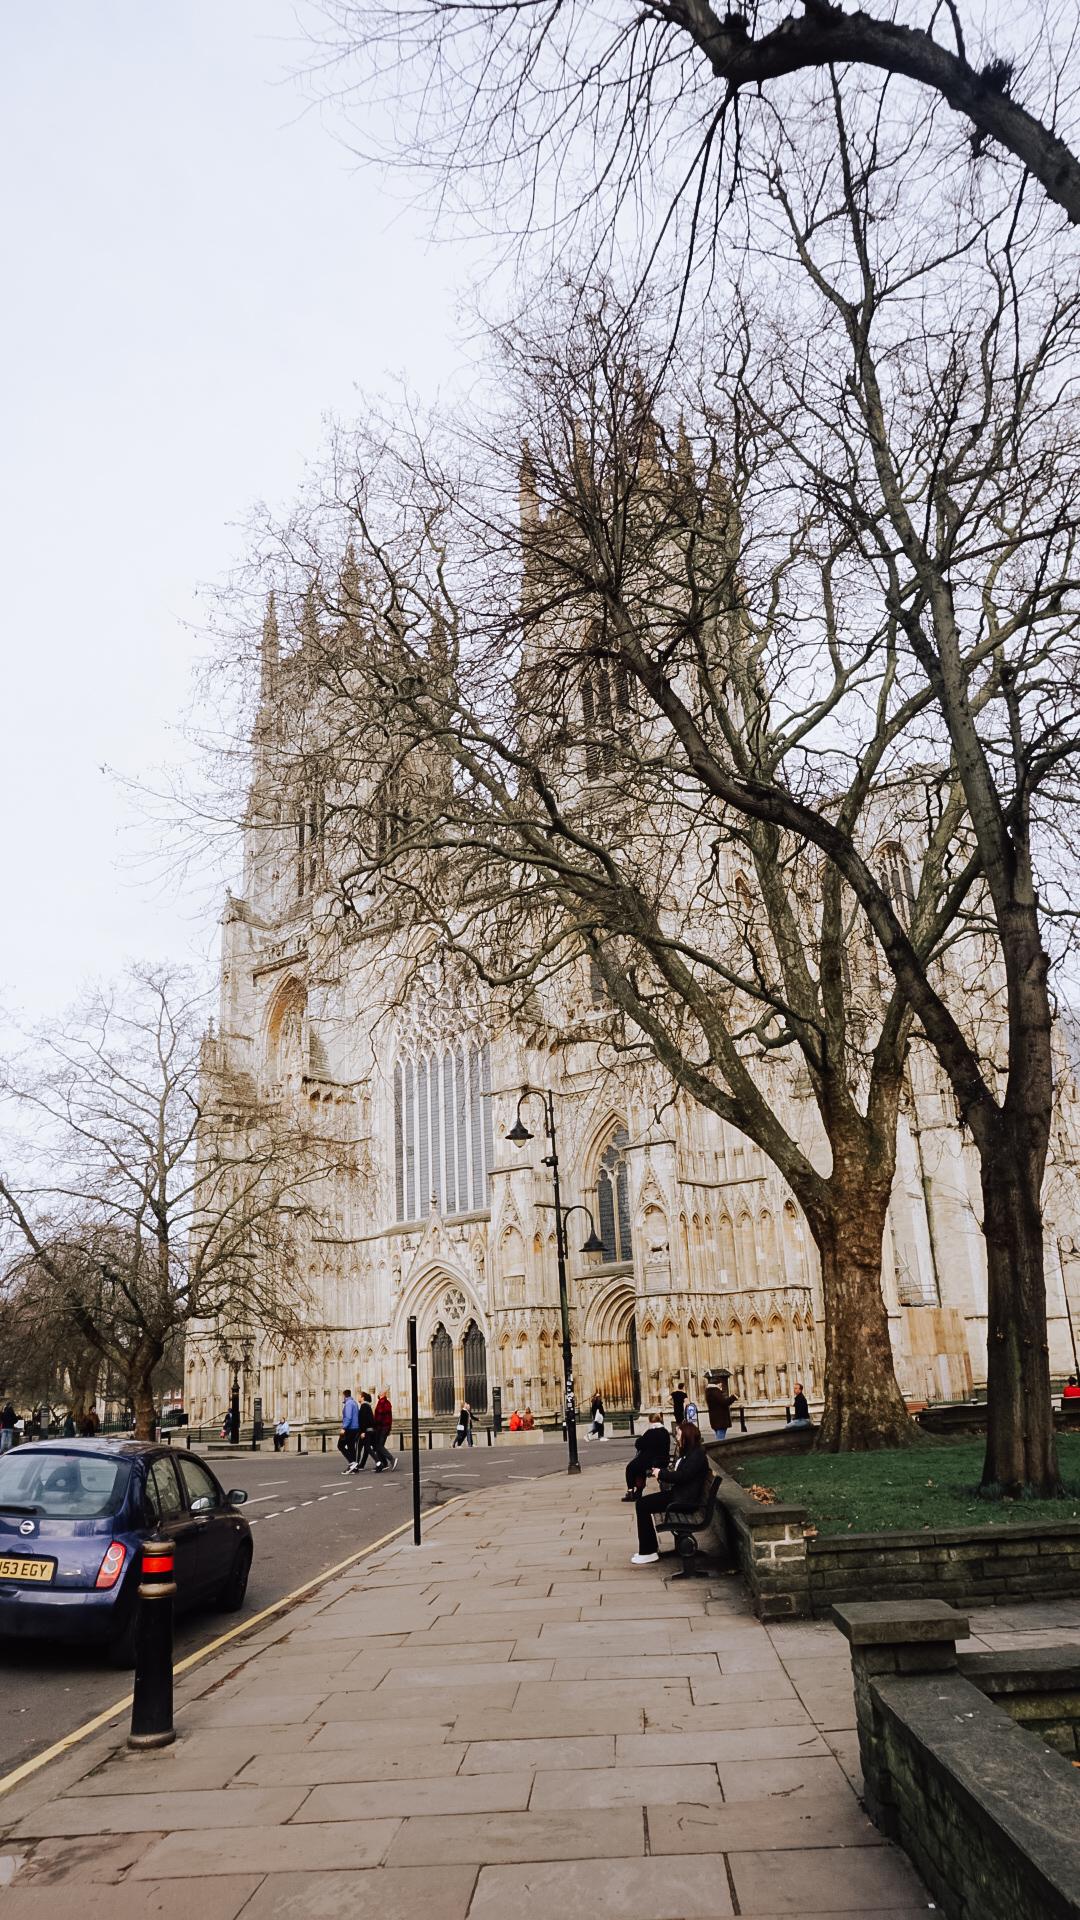 The Minster Of York